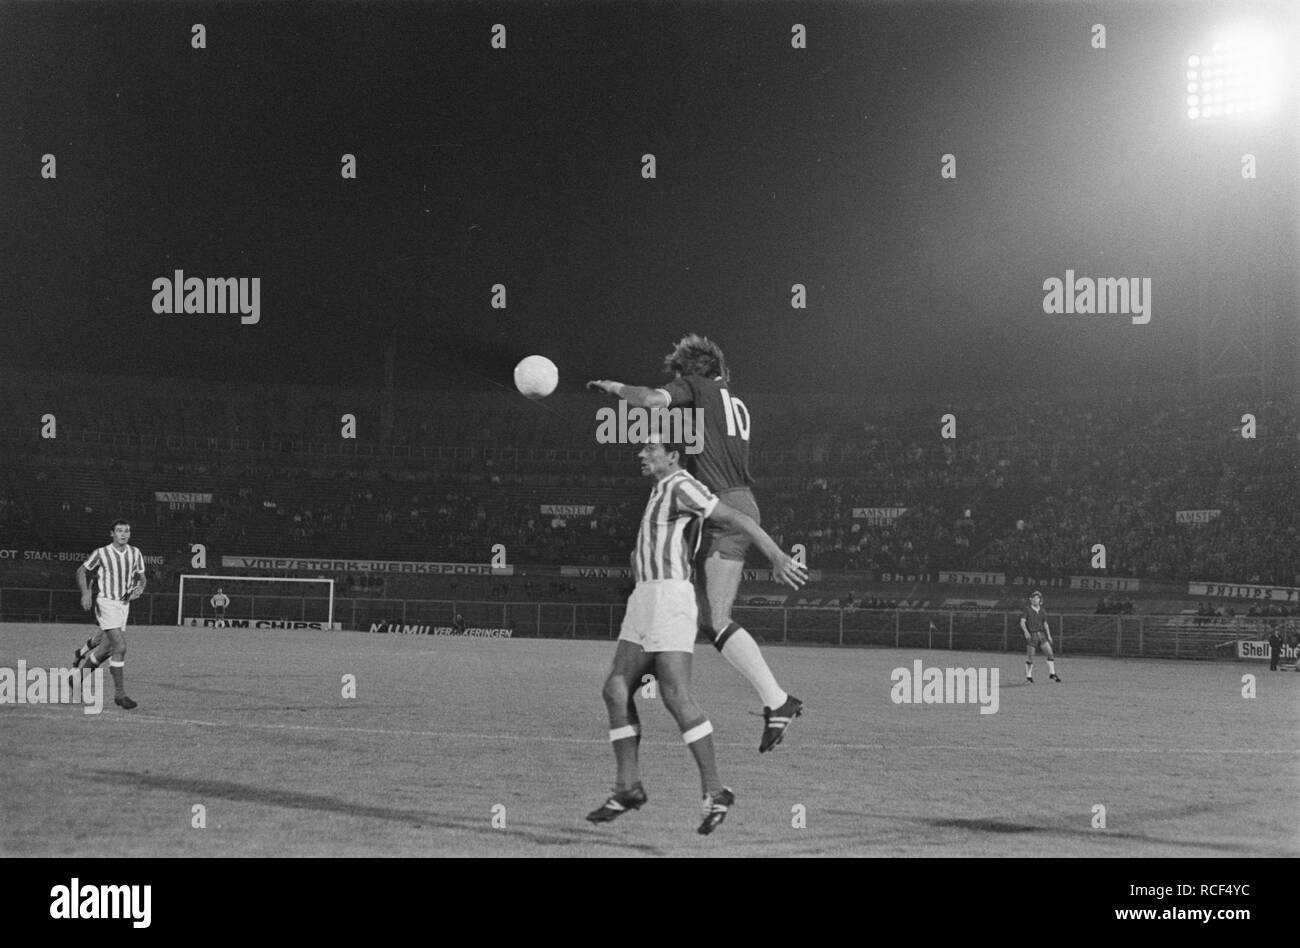 Ajax tegen Menduri Tirana 2-0, Europa Cup I, Bestanddeelnr 923-8899. - Stock Image